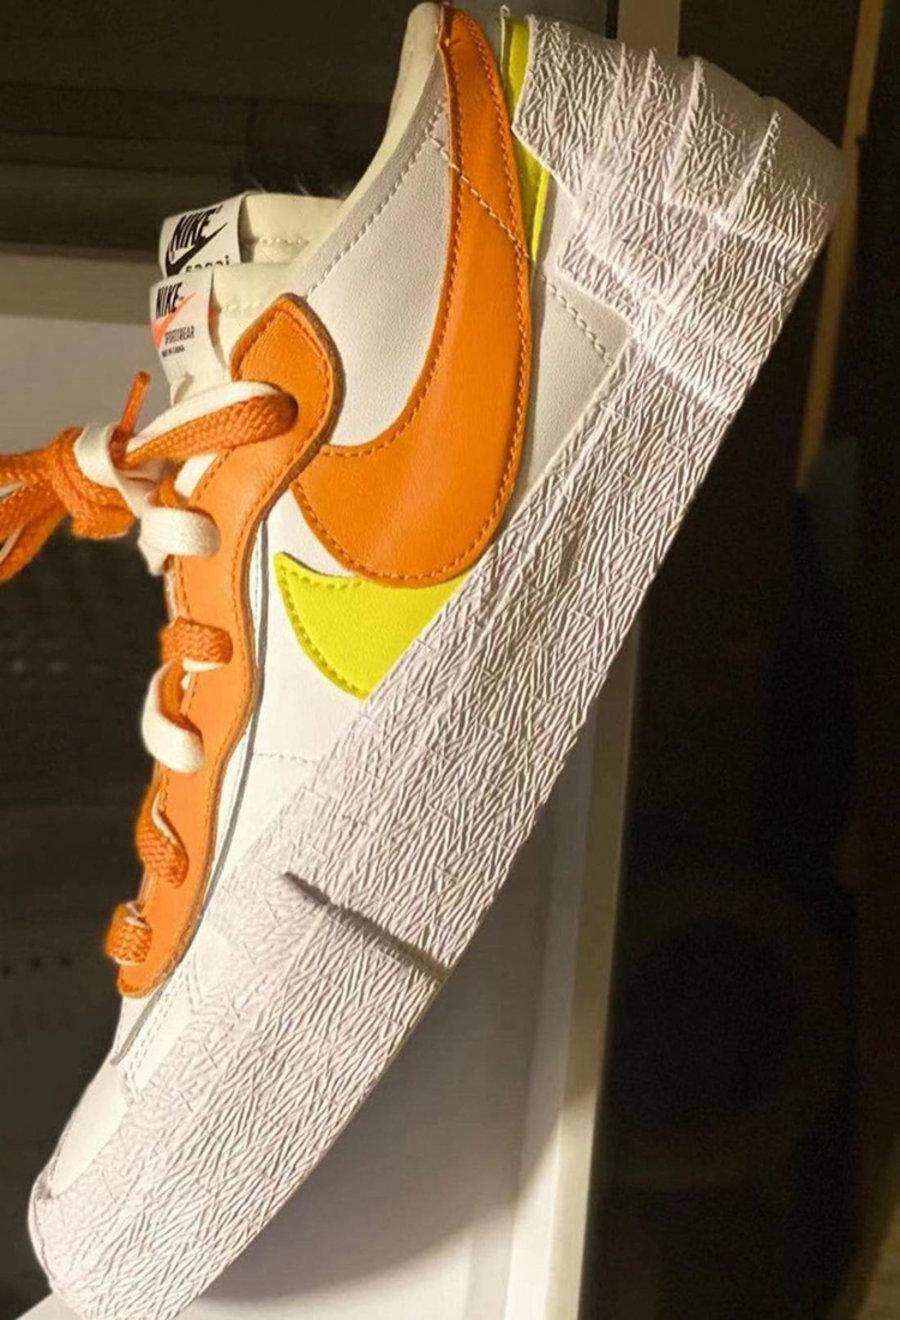 sacai,Nike,Blazer Low,DD1877-1  sacai x Nike 又出全新联名!明年 2 月正式发售!